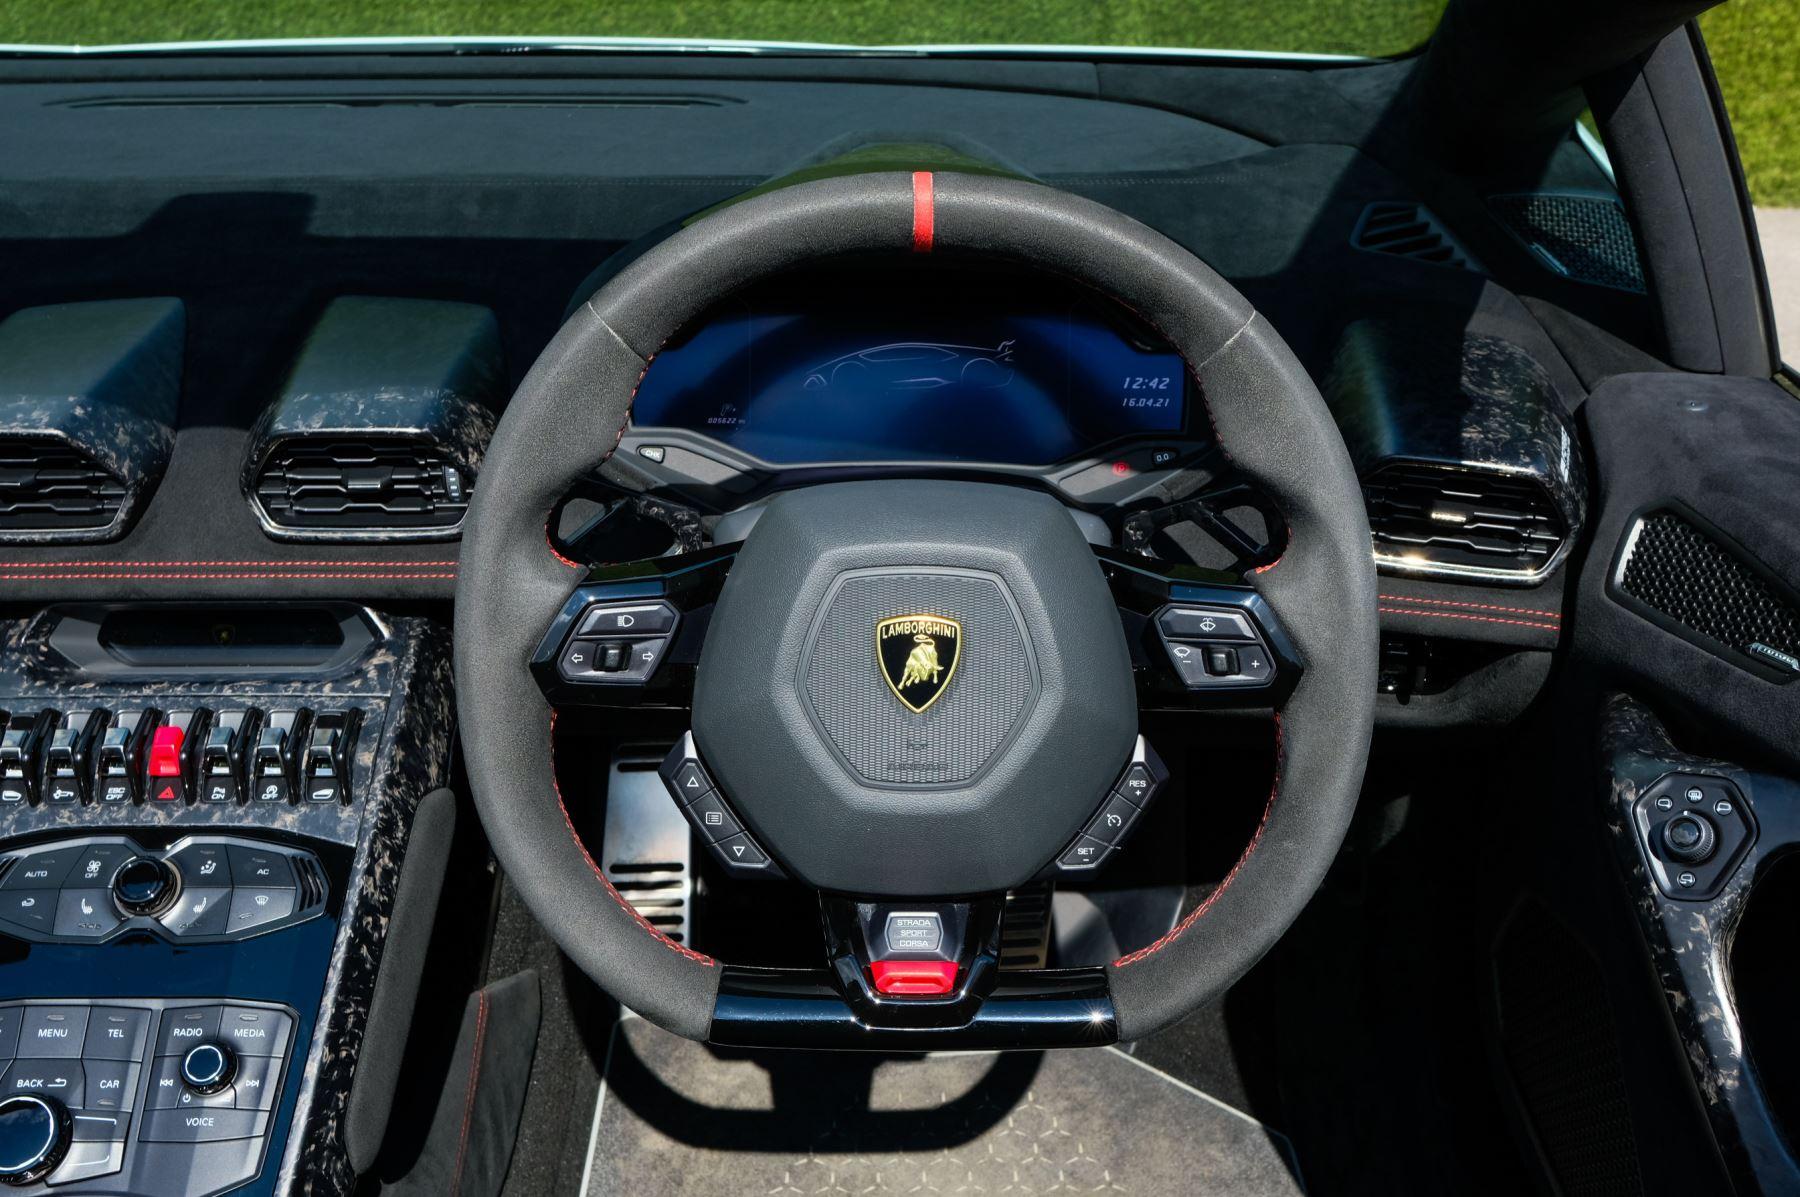 Lamborghini Huracan Performante Spyder 5.2 V10 AWD image 14